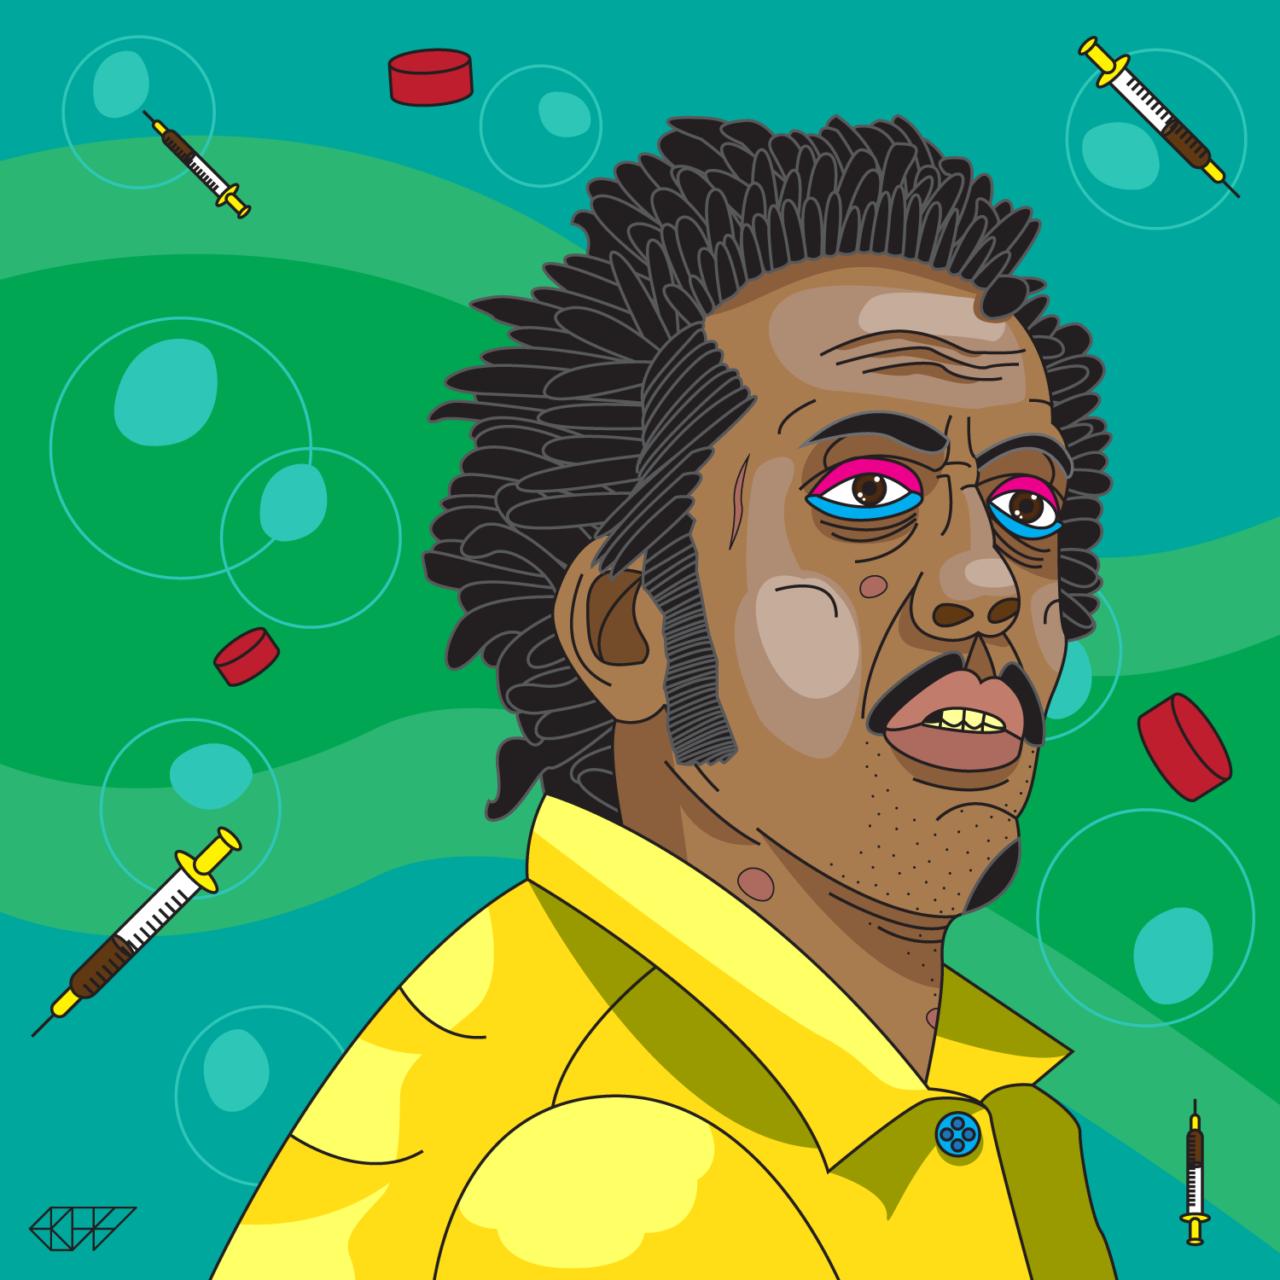 Bubbles by Corey Watson